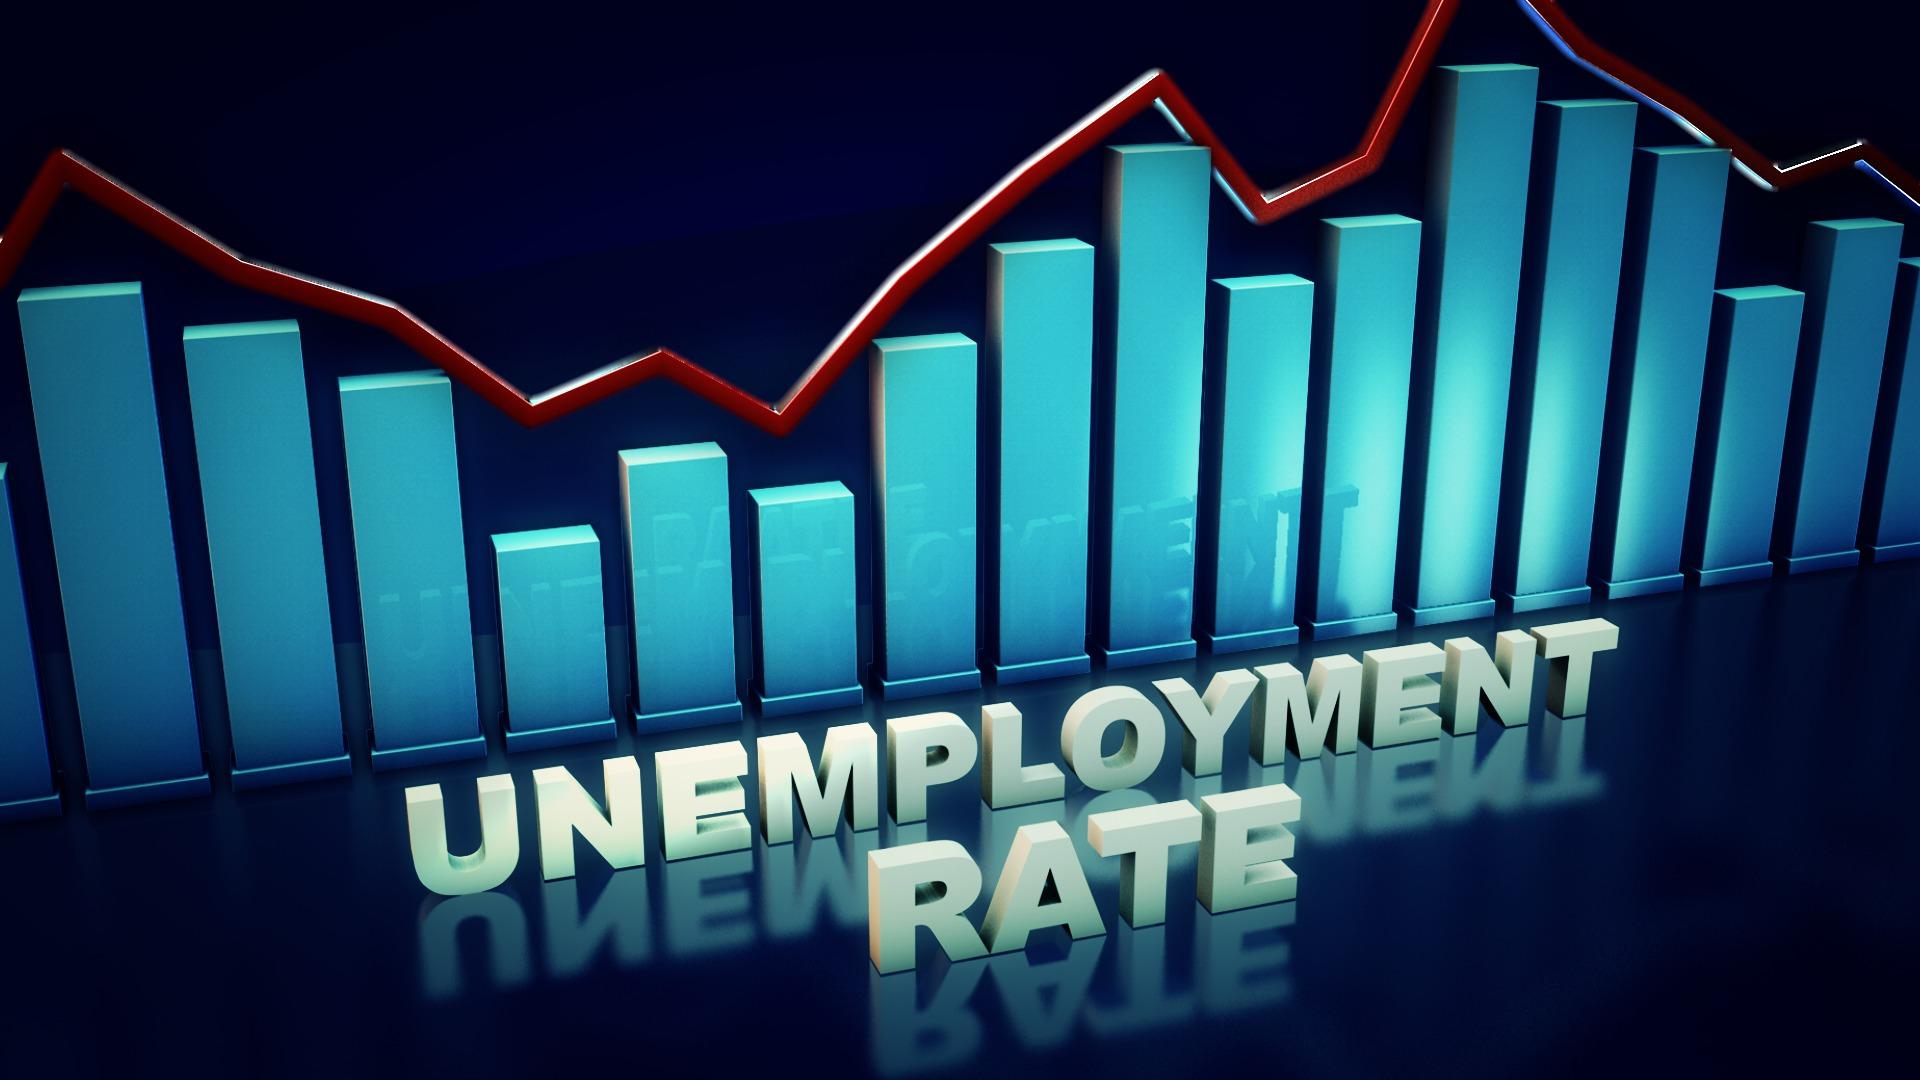 Unemployment Rate_143924